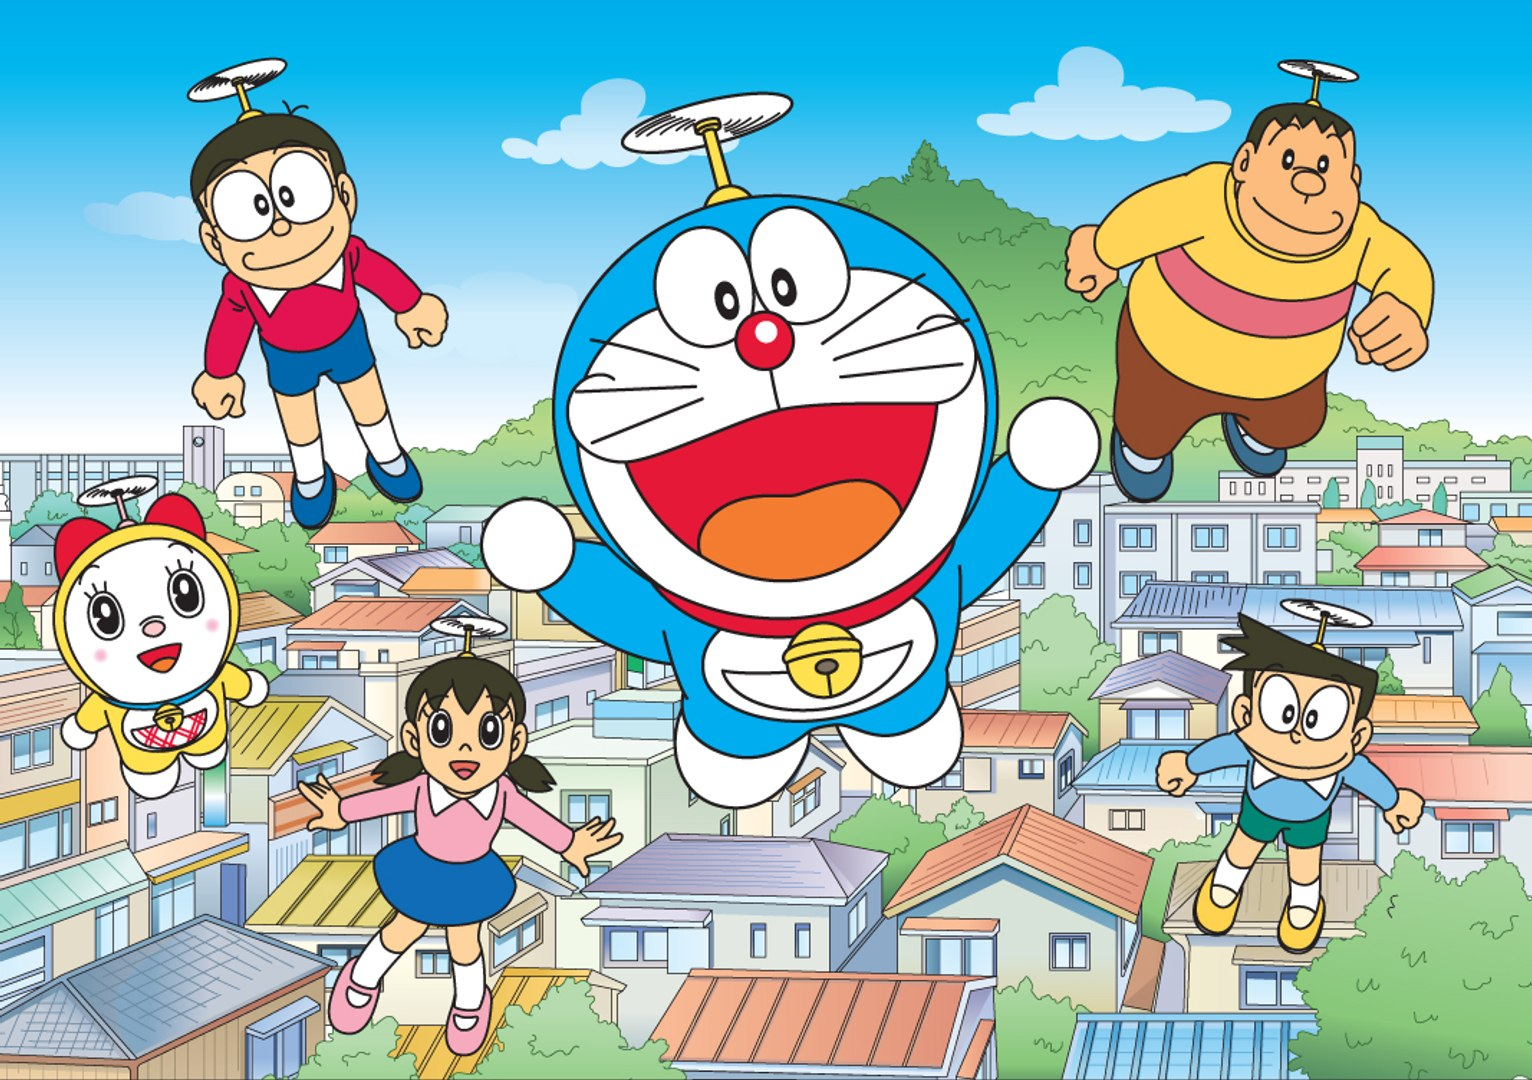 10 Judul Manga Yang Terpopuler di Dunia Sepanjang Masa 12